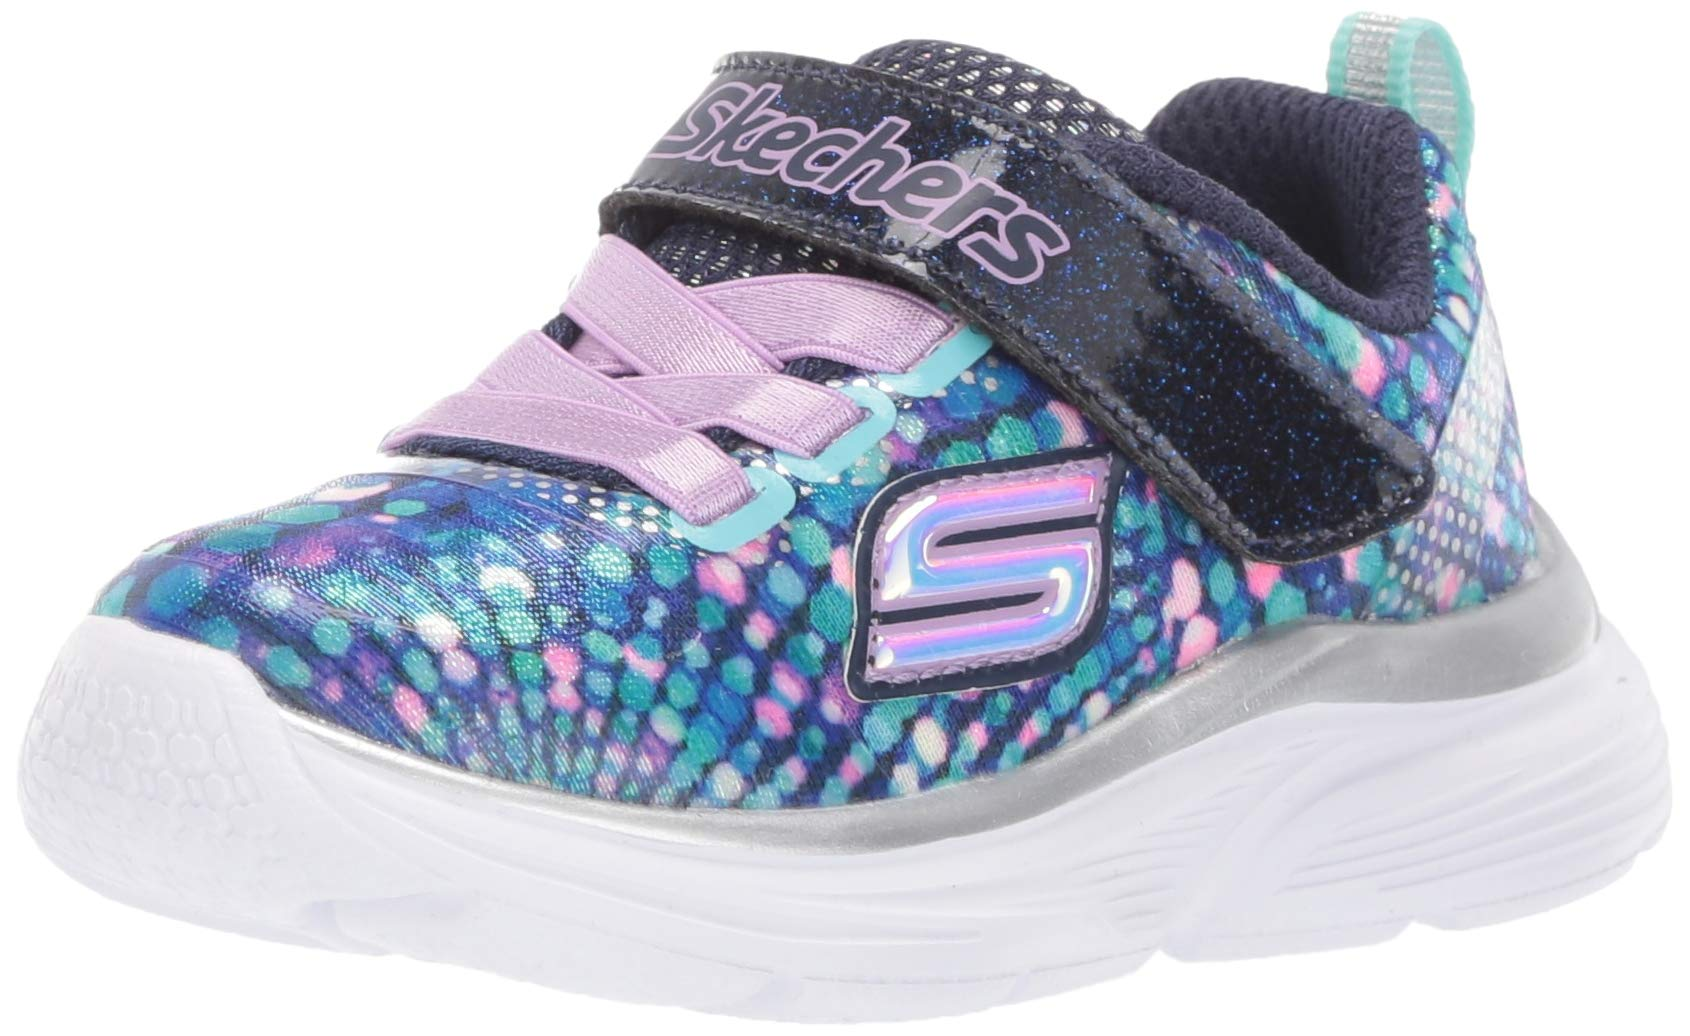 Skechers Kids Girls' Wavy Lites Sneaker, Navy/Multi, 1.5 Medium US Little Kid